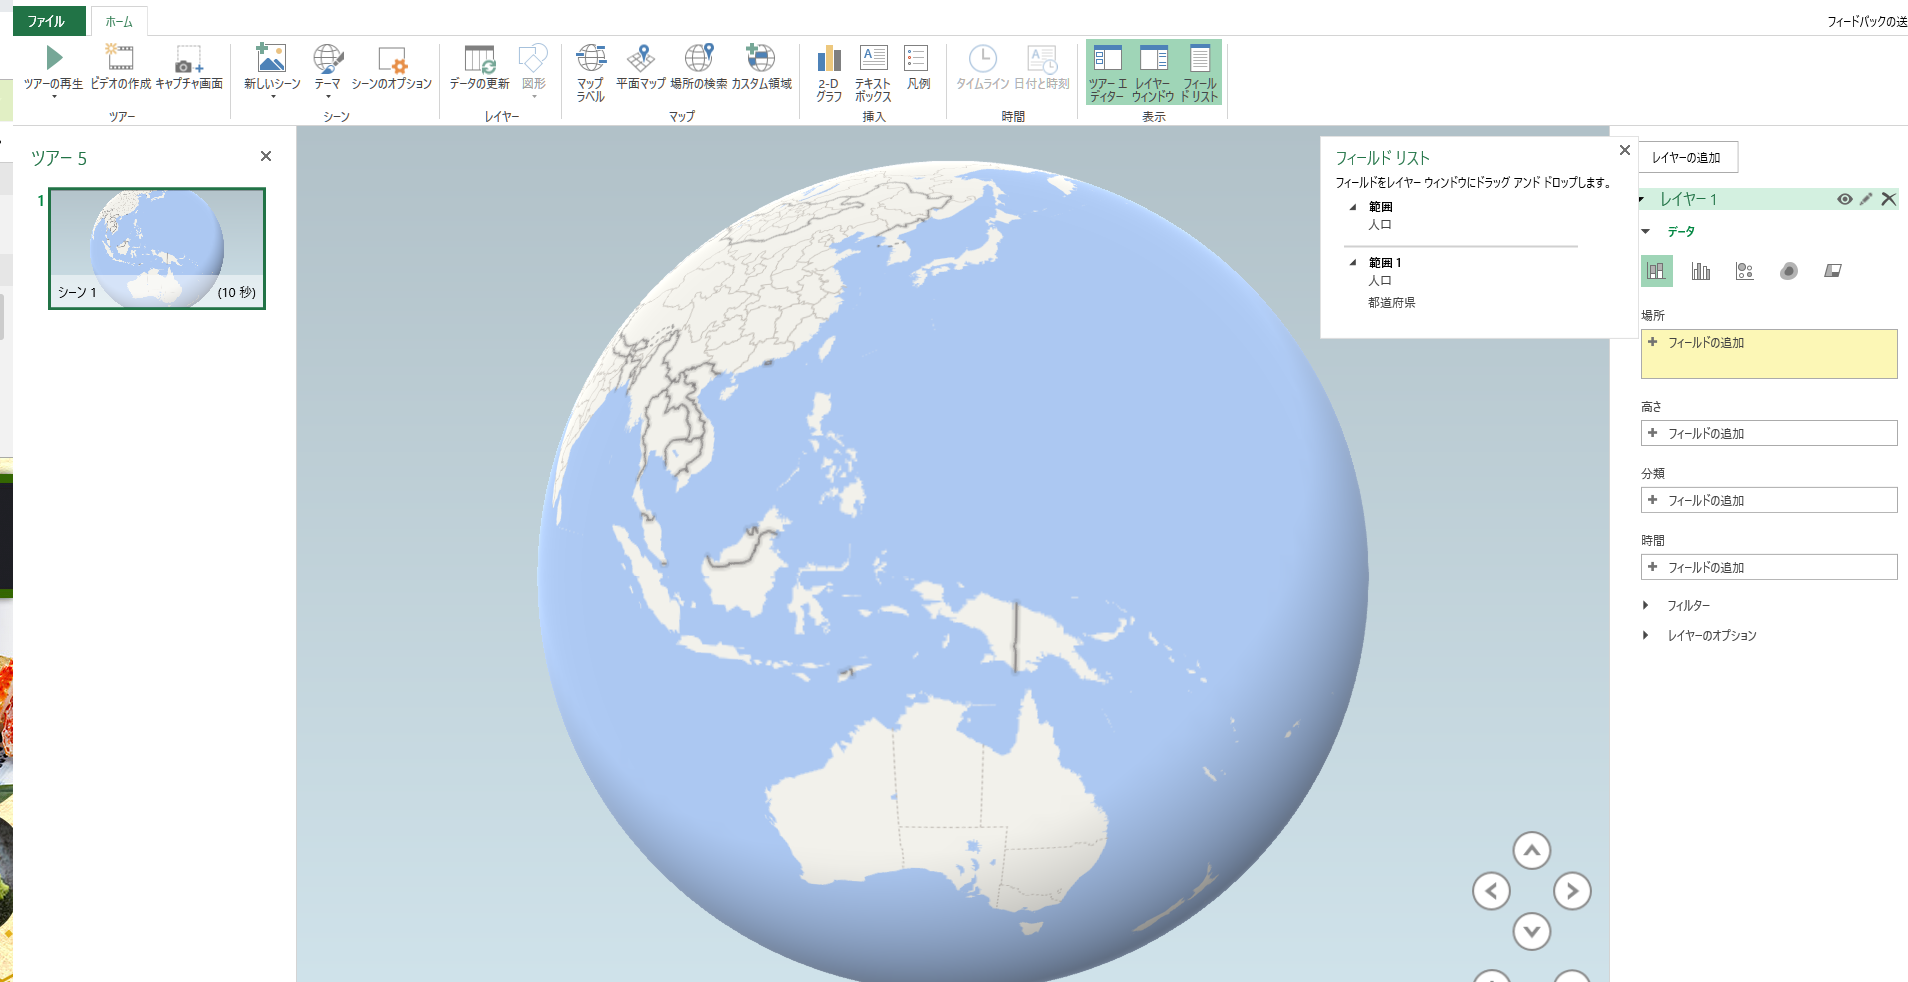 3Dマップの初期画面